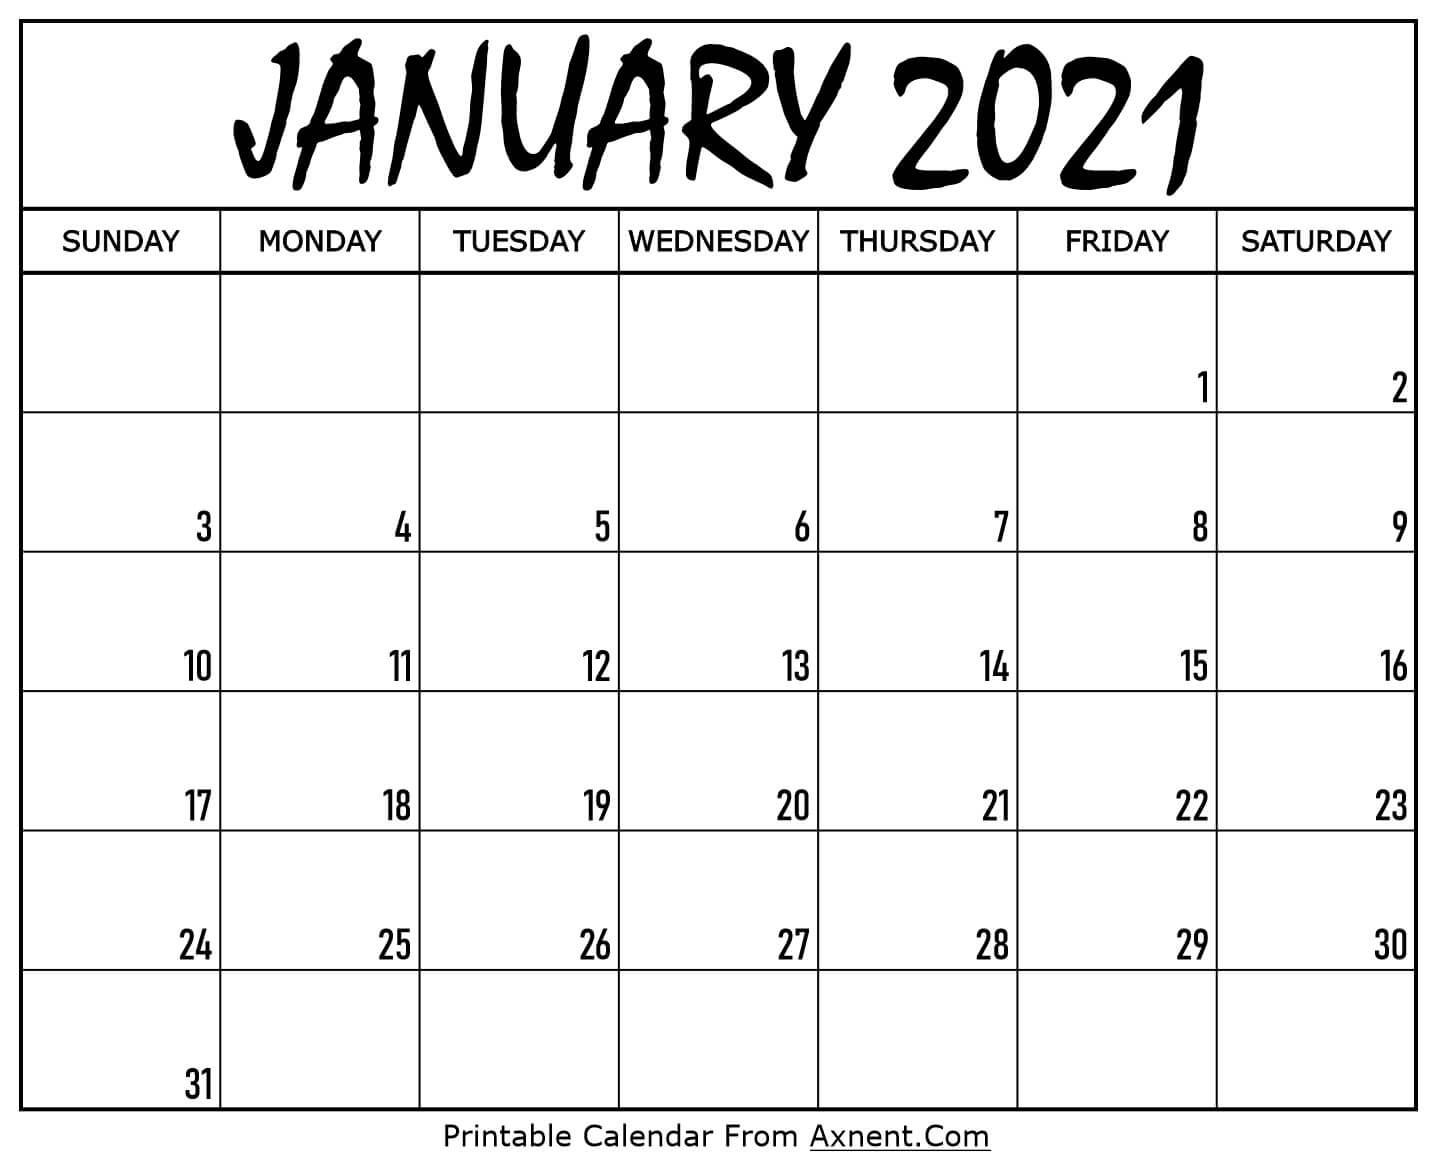 Printable January 2021 Calendar Template - Time Management  A3 Calendar Template